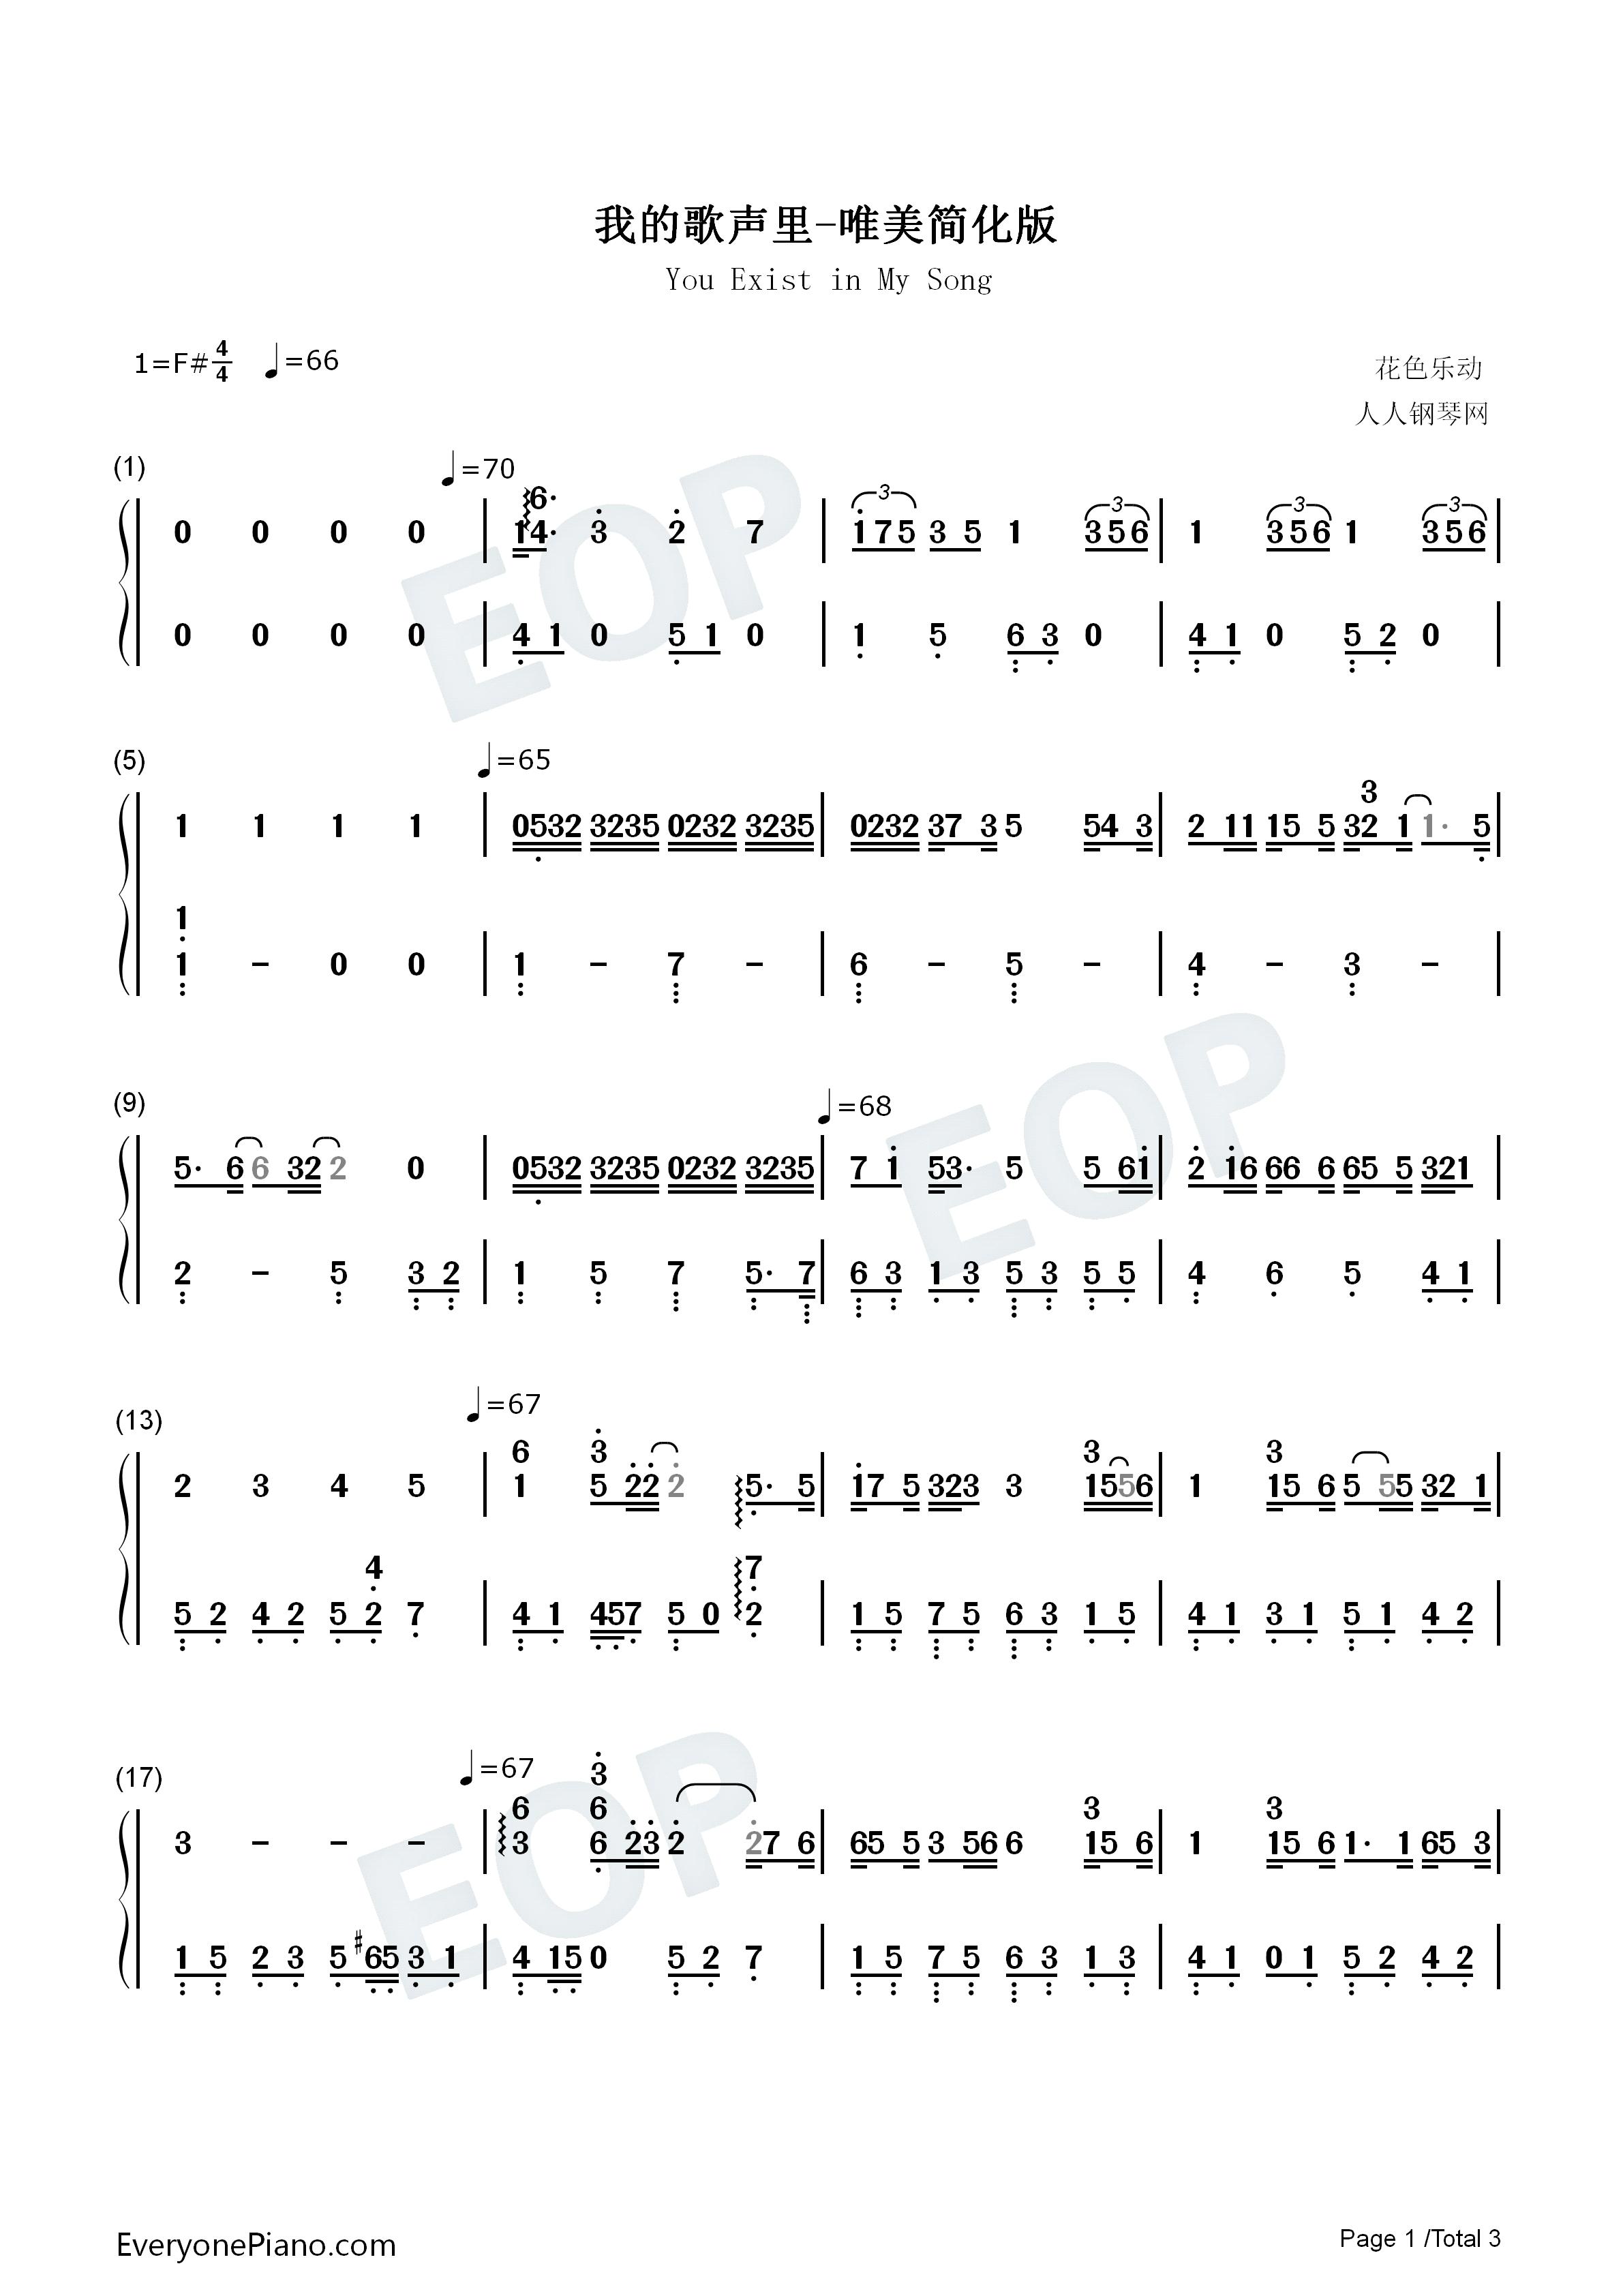 eop教学曲双手简谱预览1;